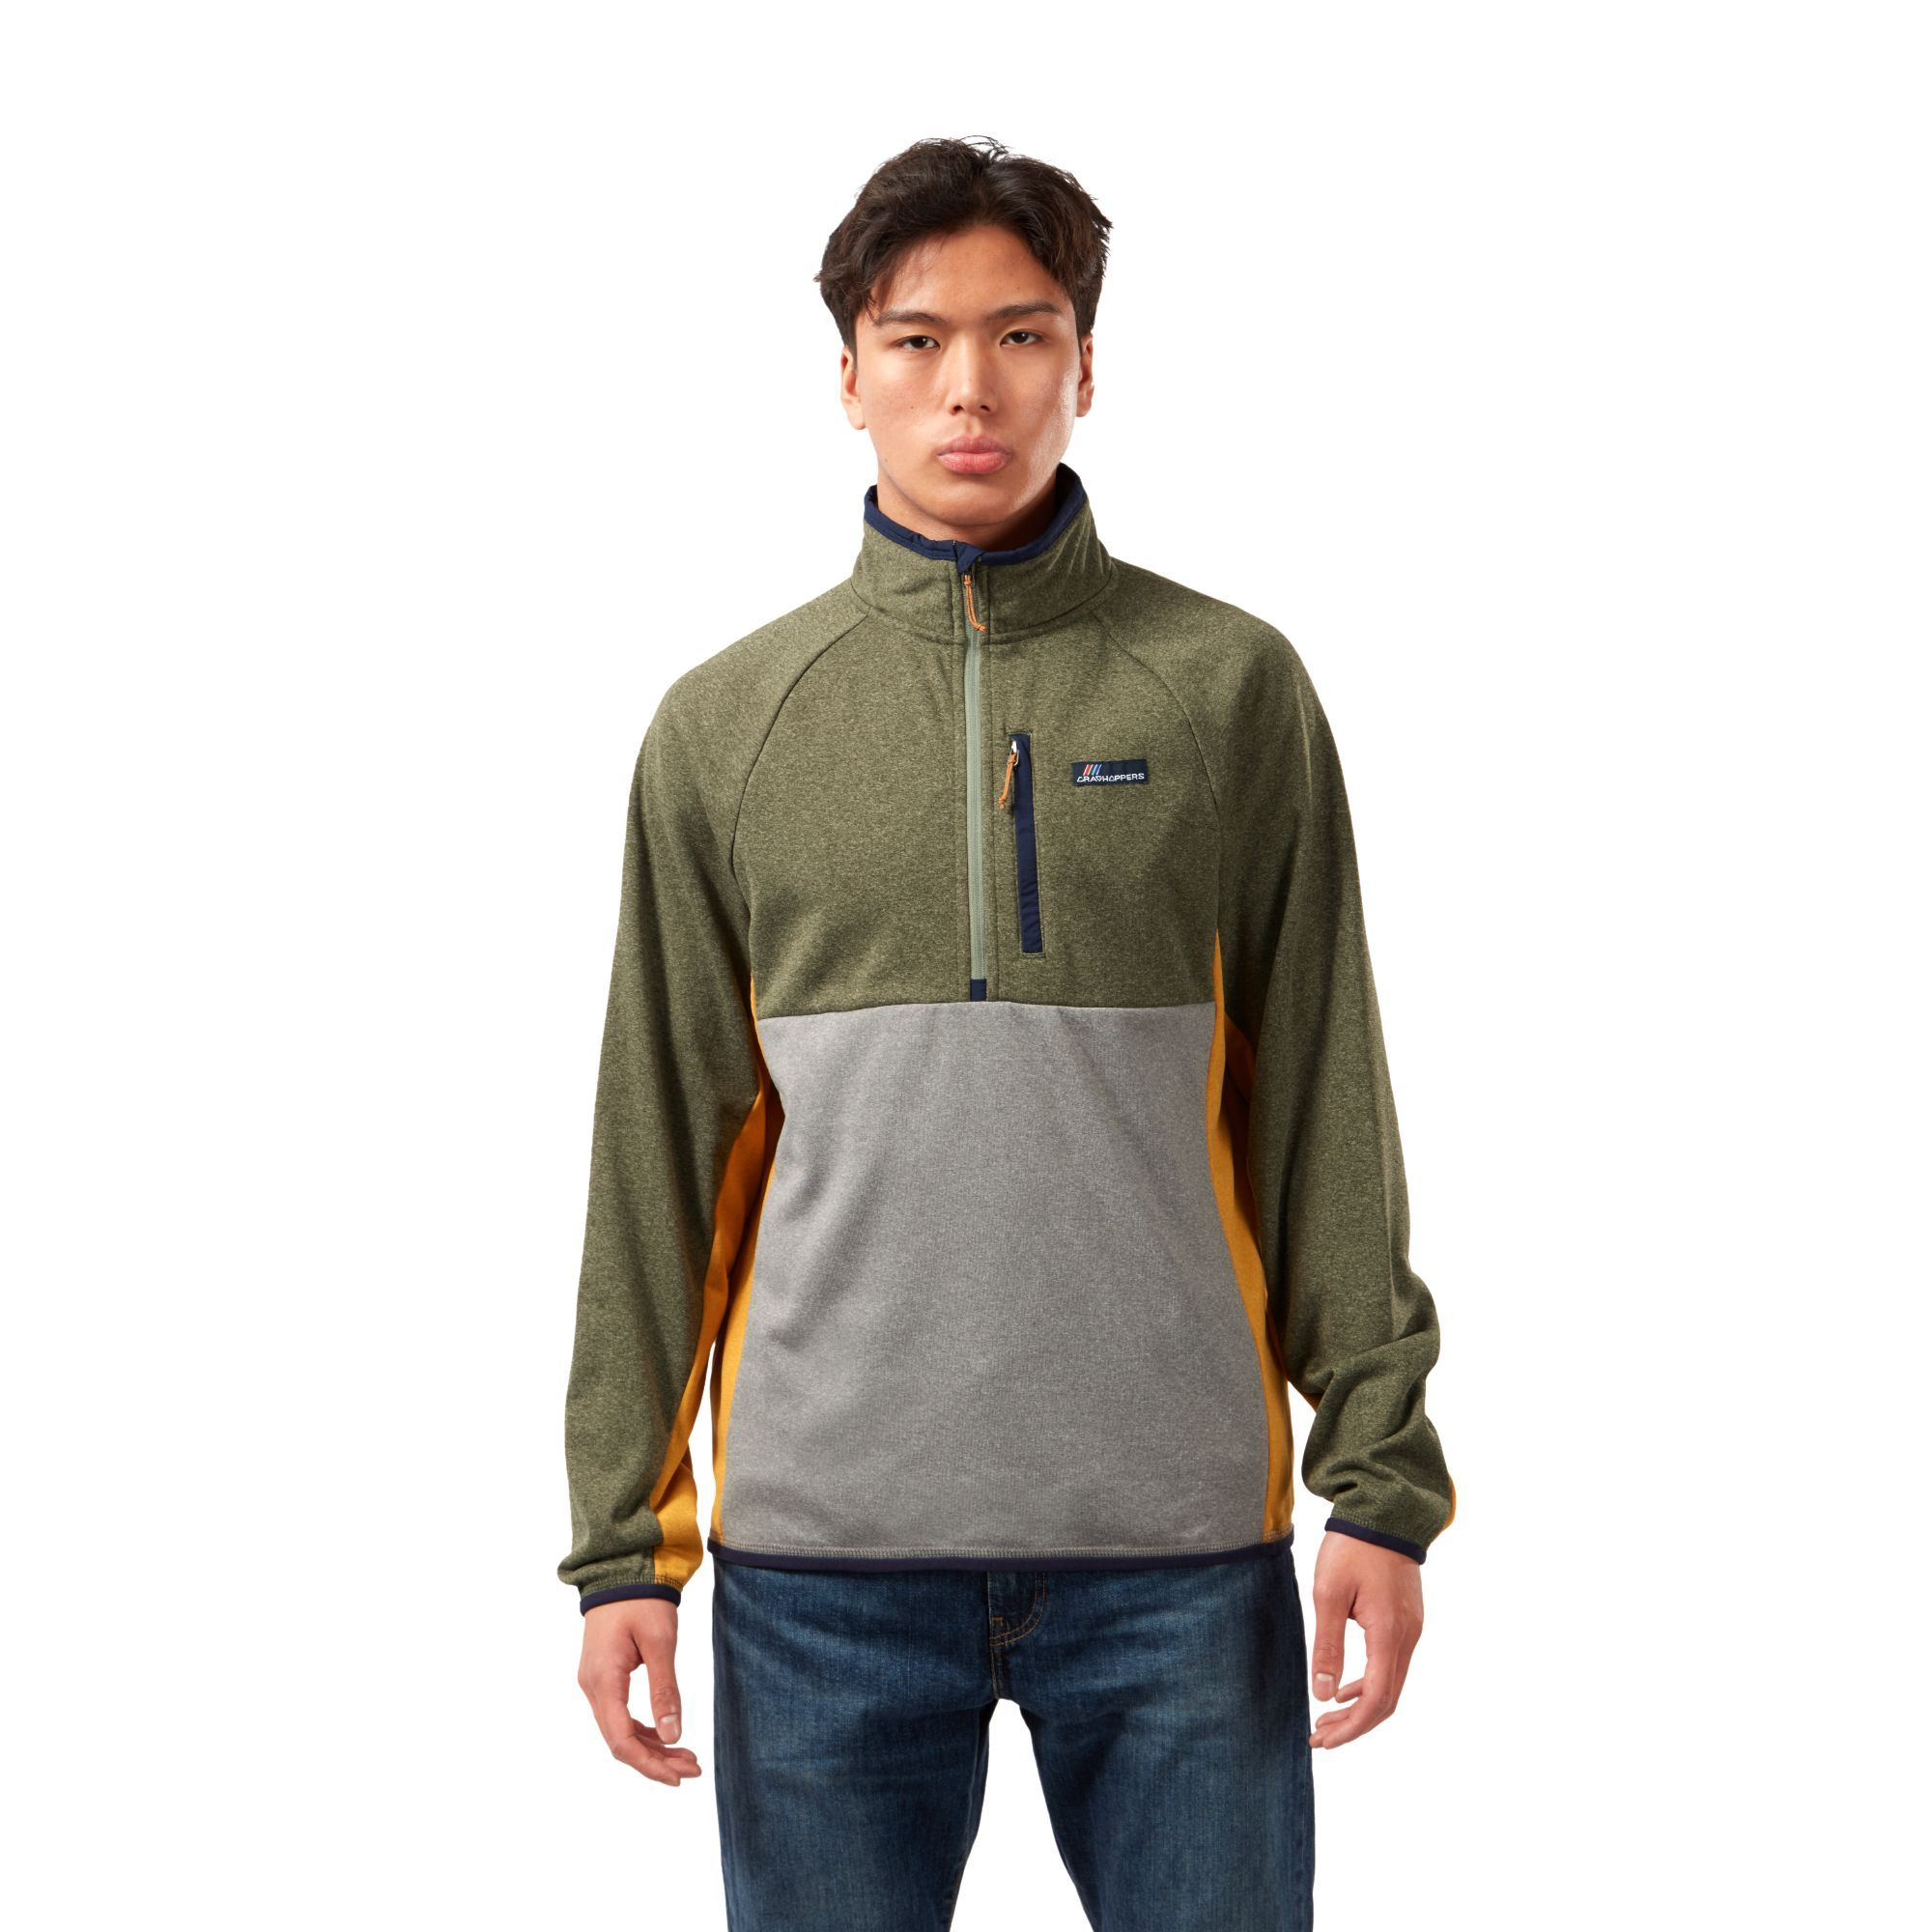 Craghoppers Mens Waymoth Marl Fleece Top (Parka Green/Cloud Grey)